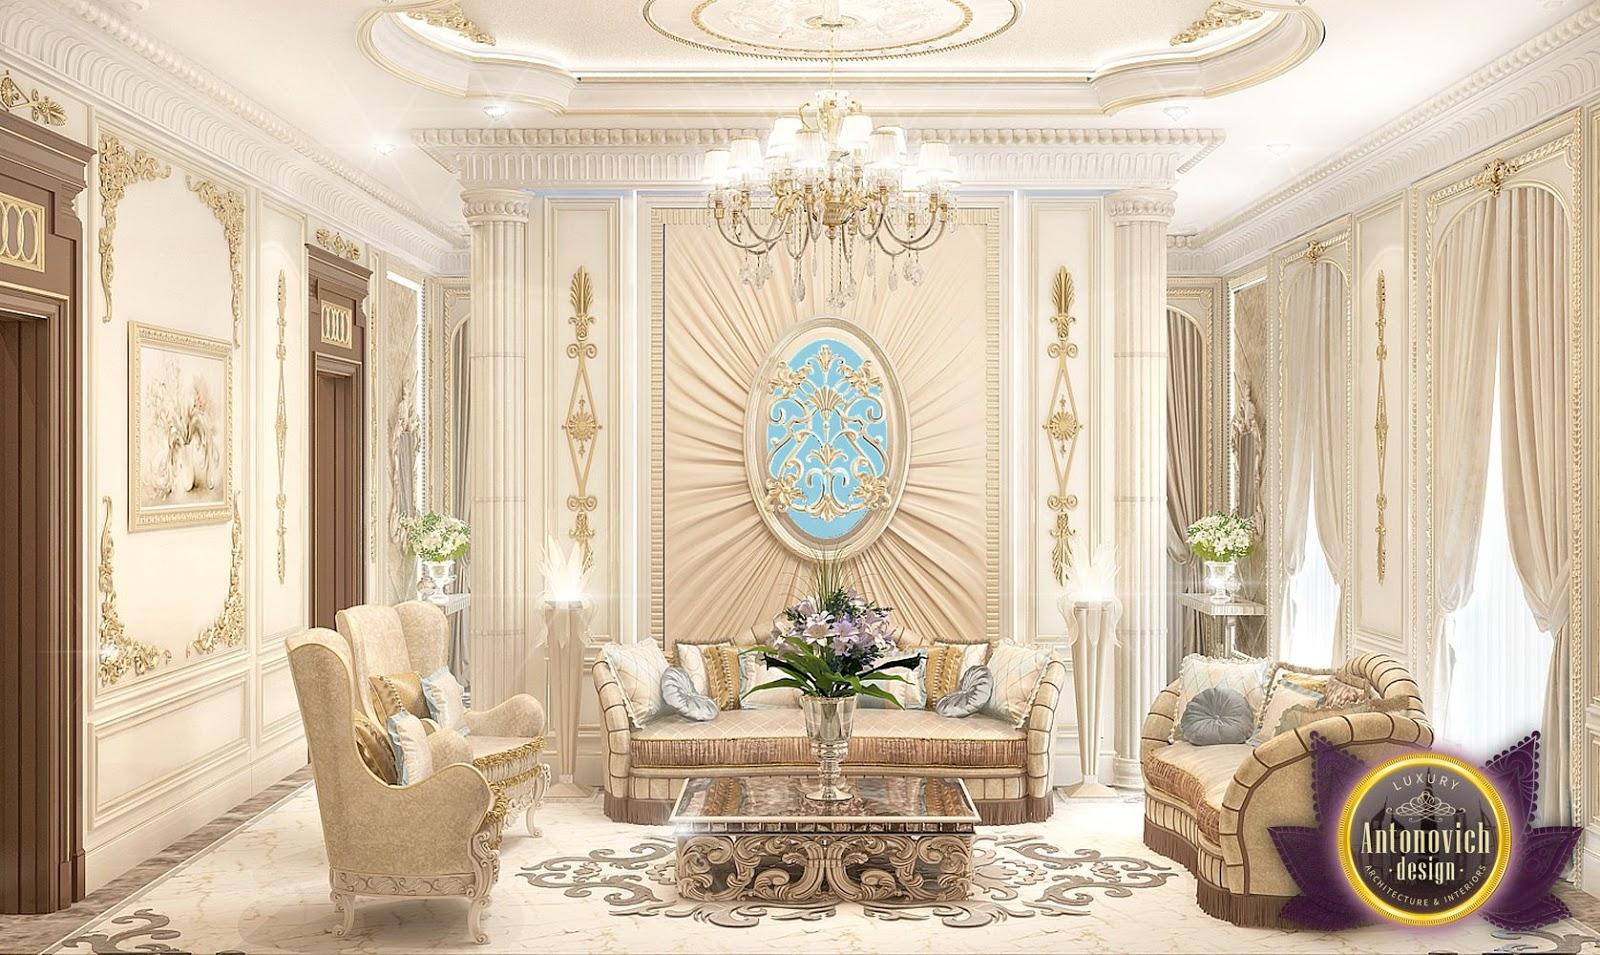 luxurious arabic style bedroom nigeiradesign: Luxury Royal Arabic Master Bedroom of